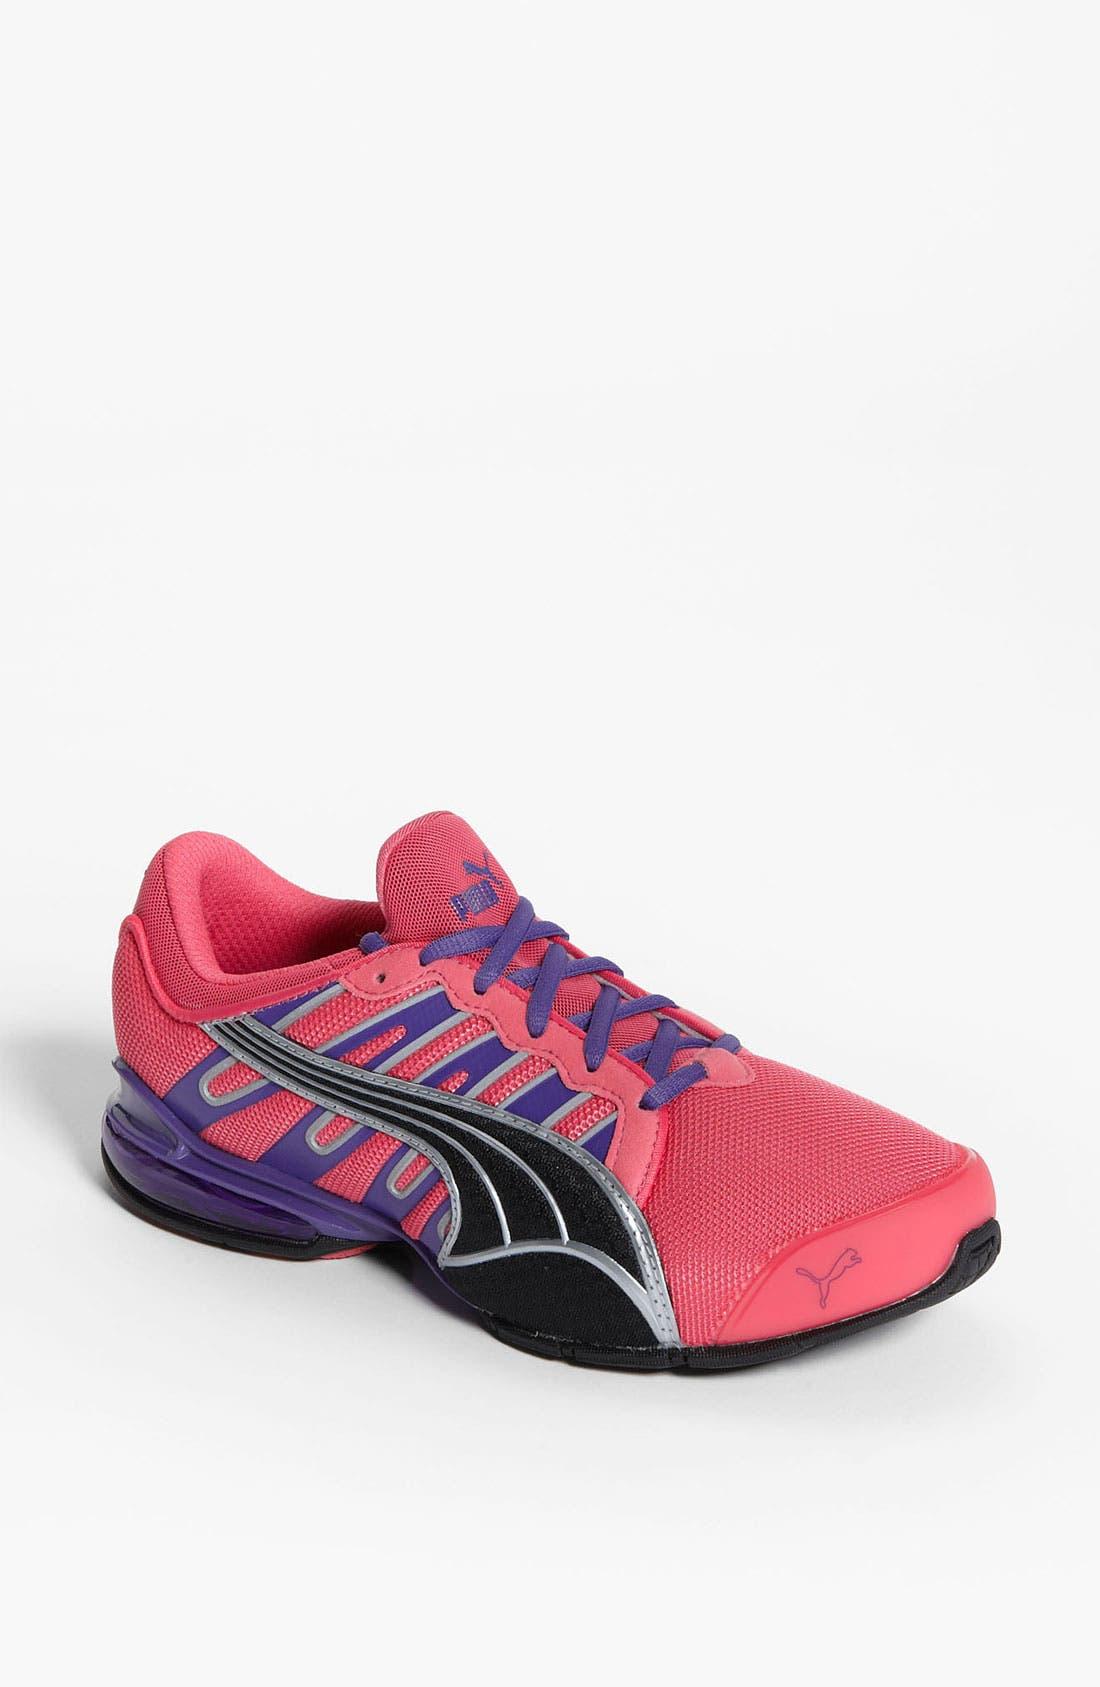 Main Image - PUMA 'Voltaic 3' Sneaker (Women)